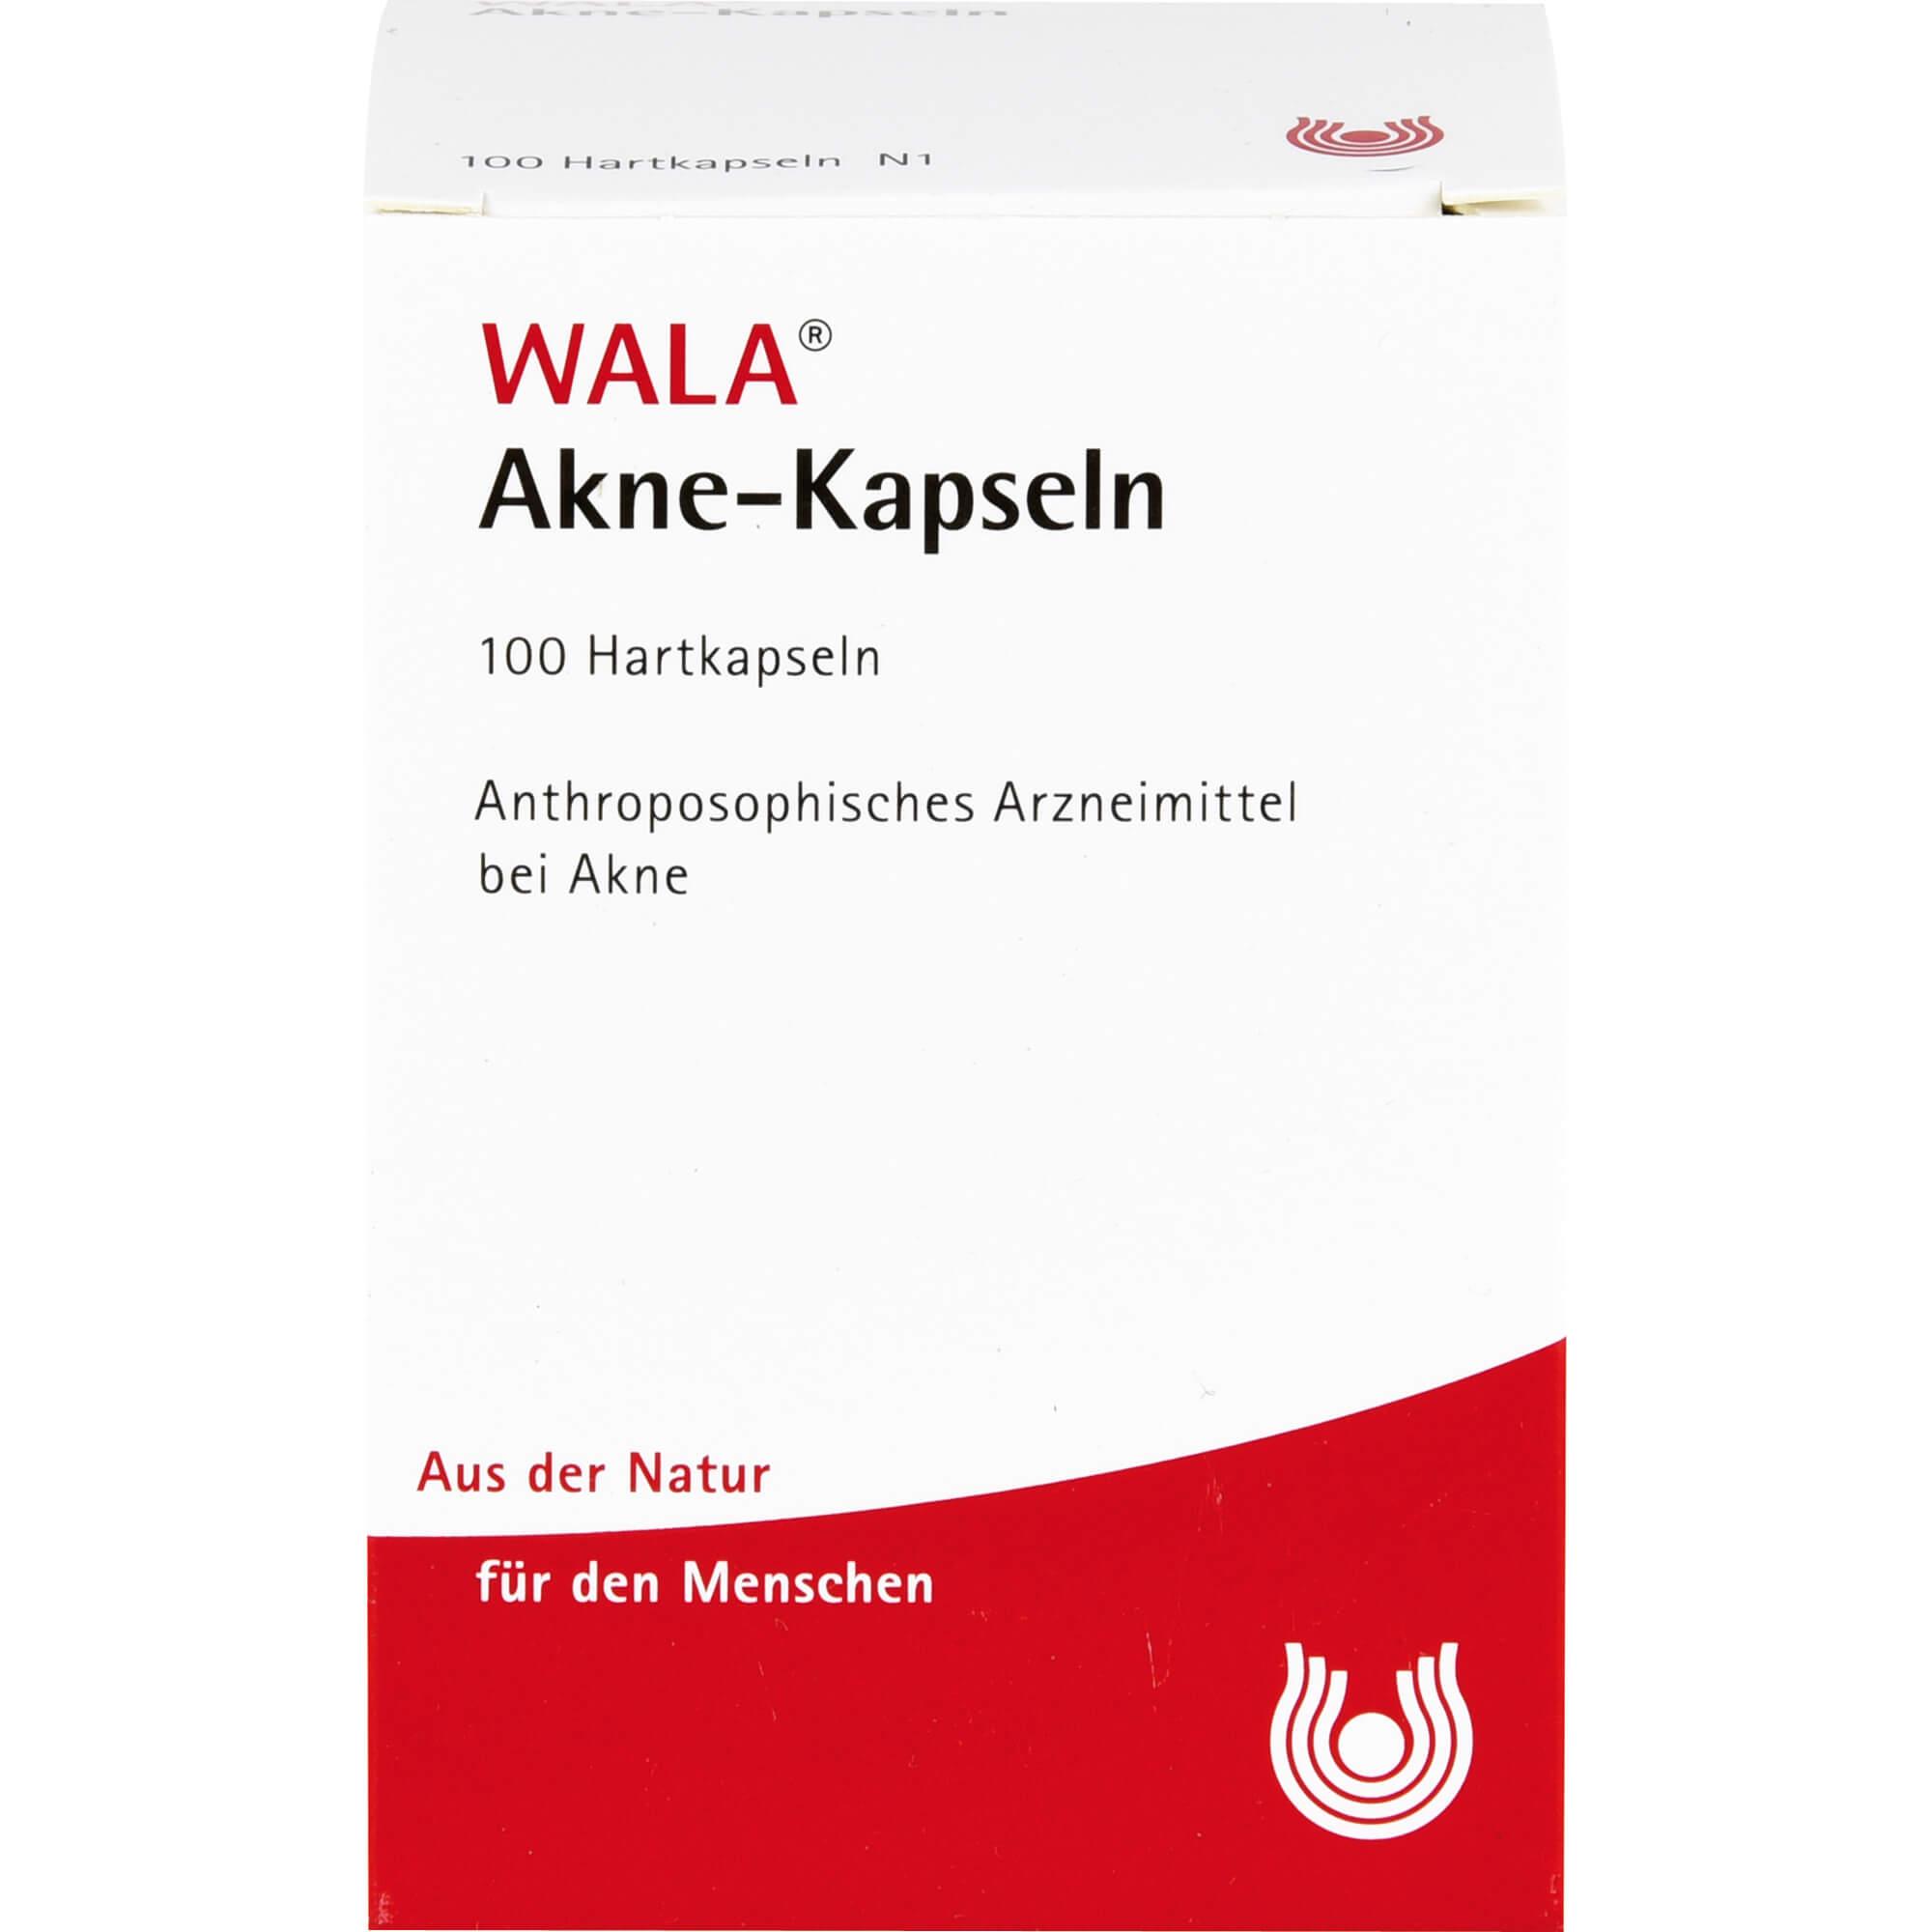 AKNE-KAPSELN